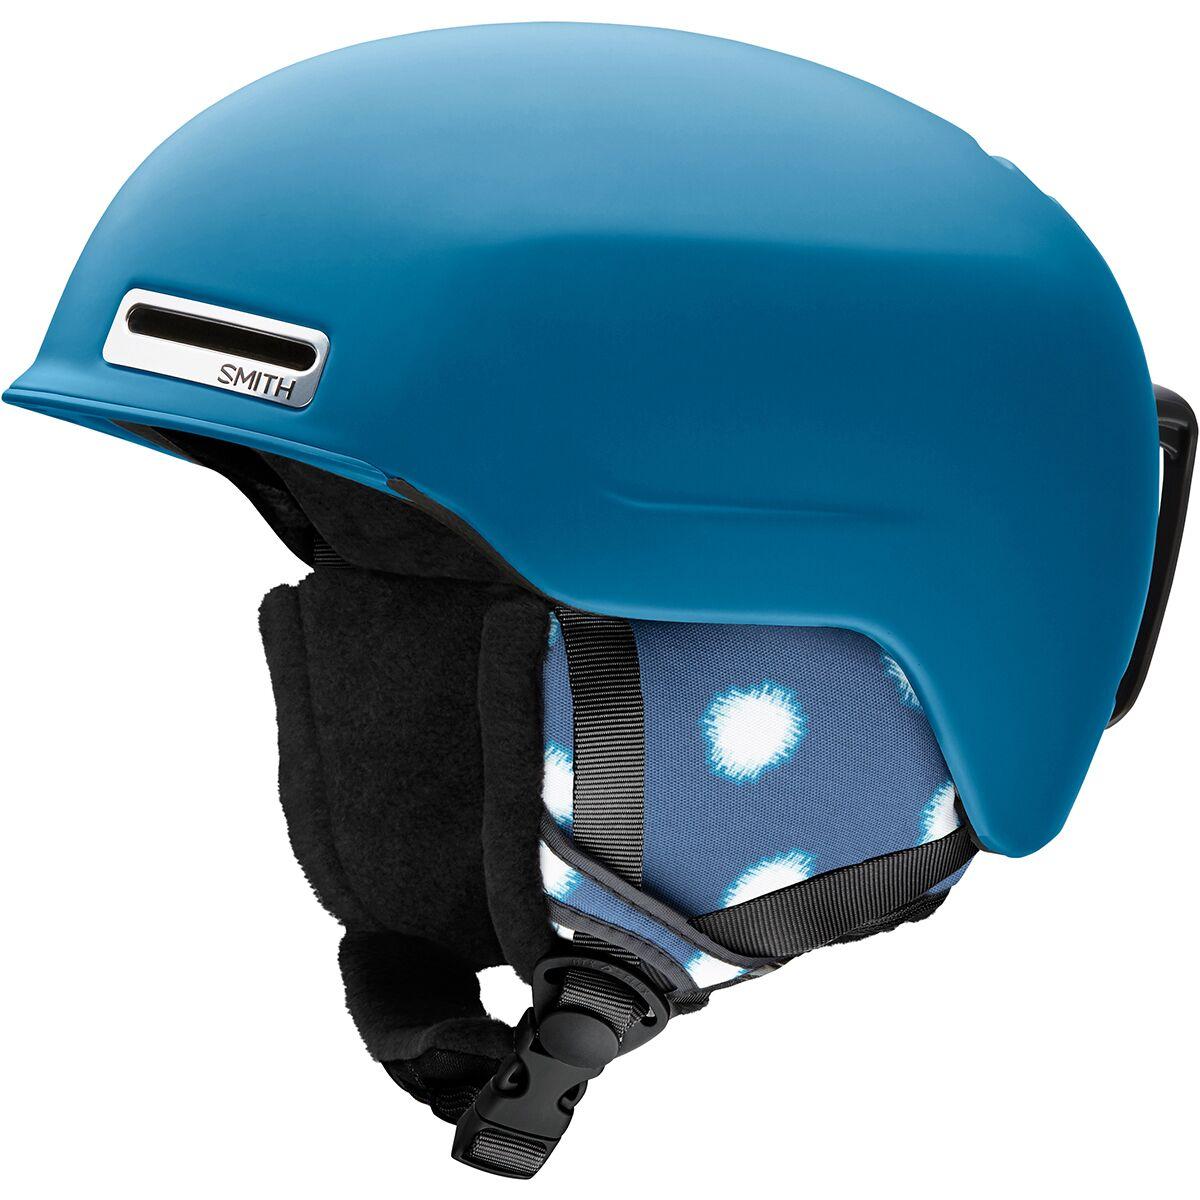 Smith-Allure-Helmet-Women-039-s miniature 8